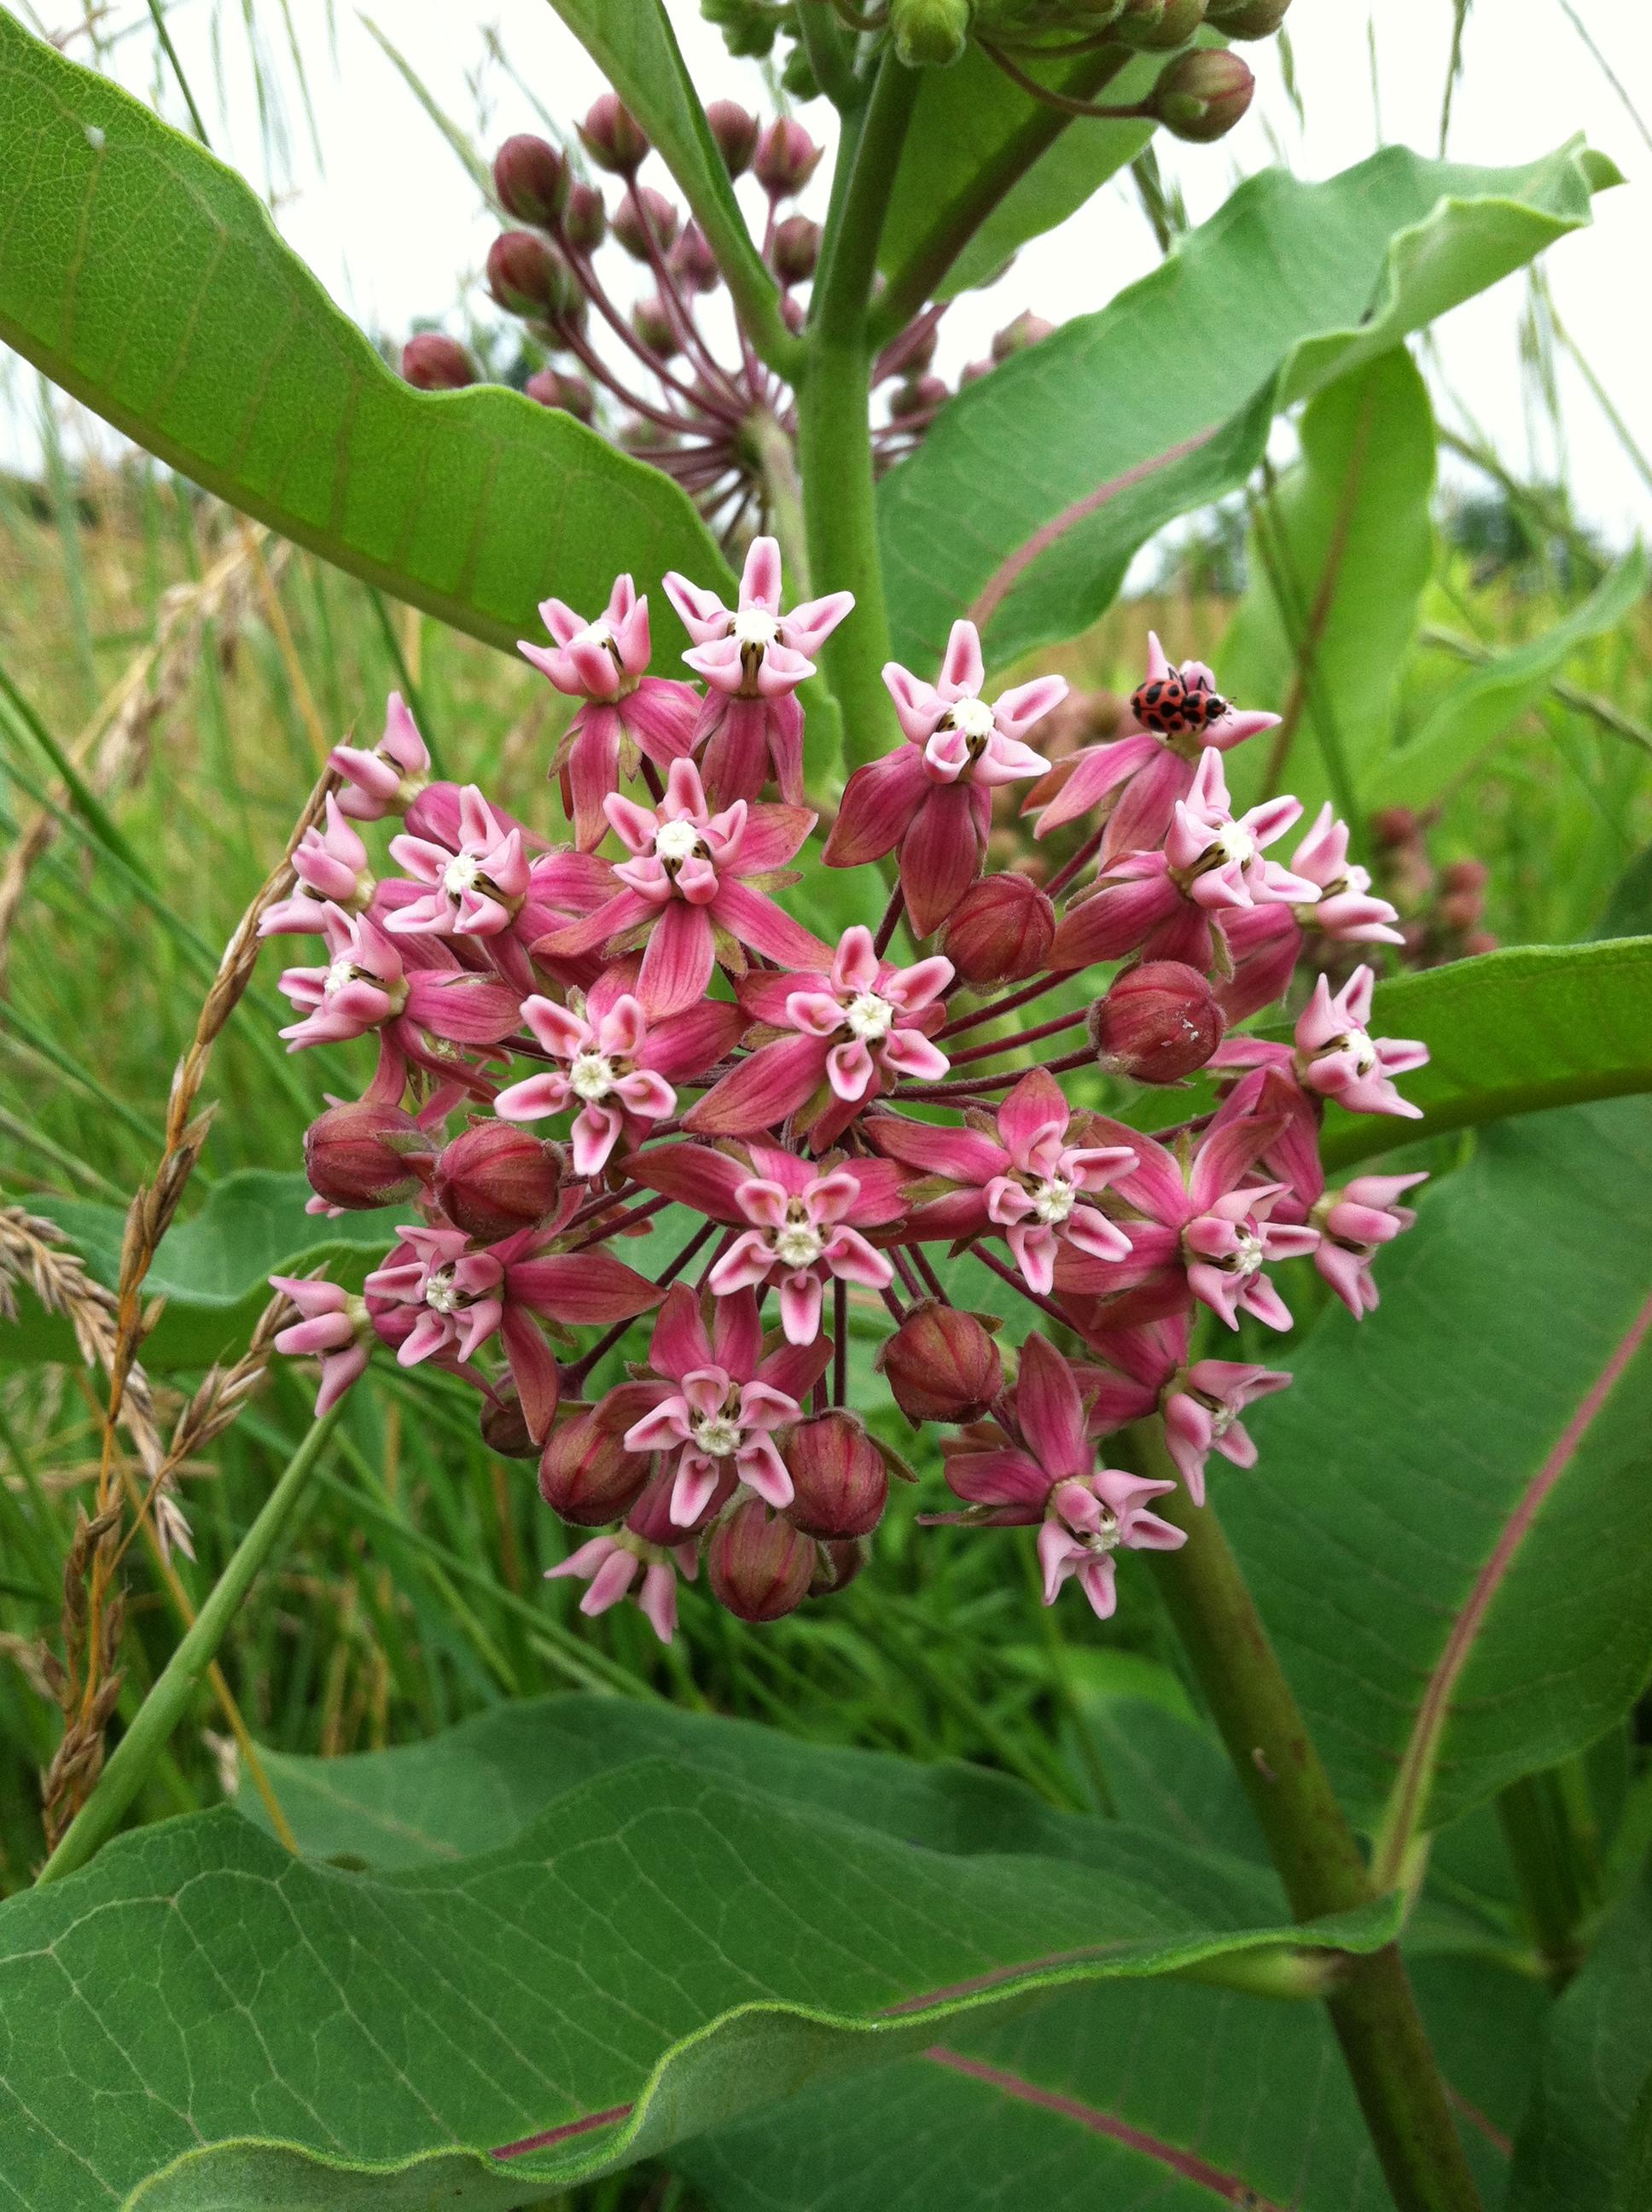 milkweed flower ladybug